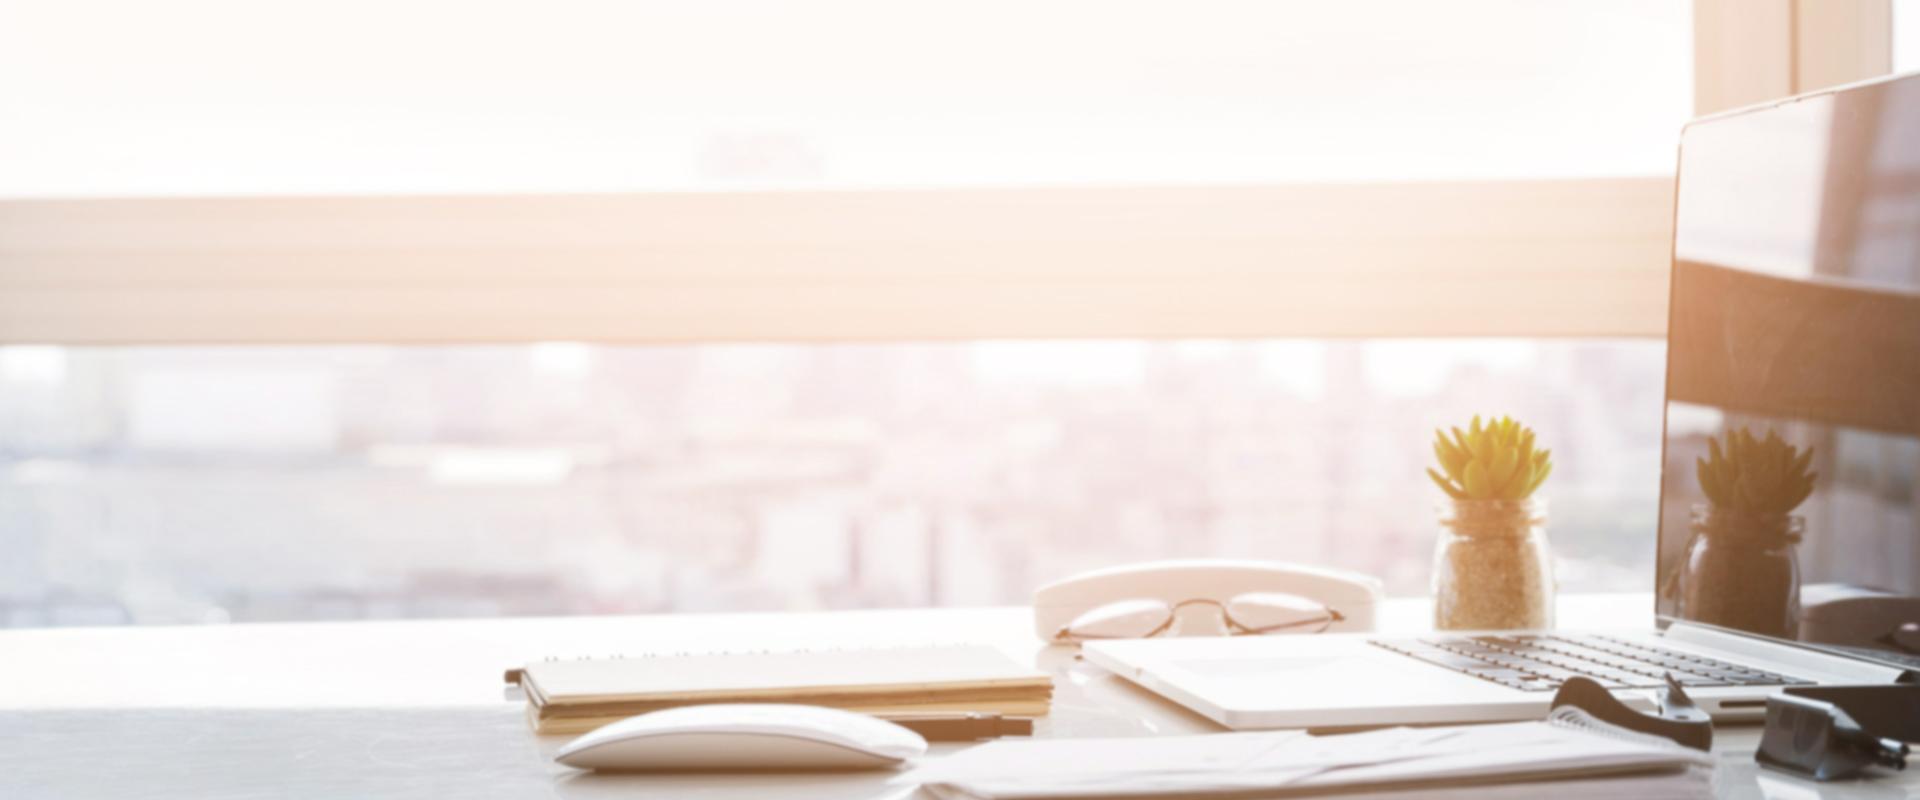 telerik-academy-upskill-salesforce-commerce-cloud-webinar